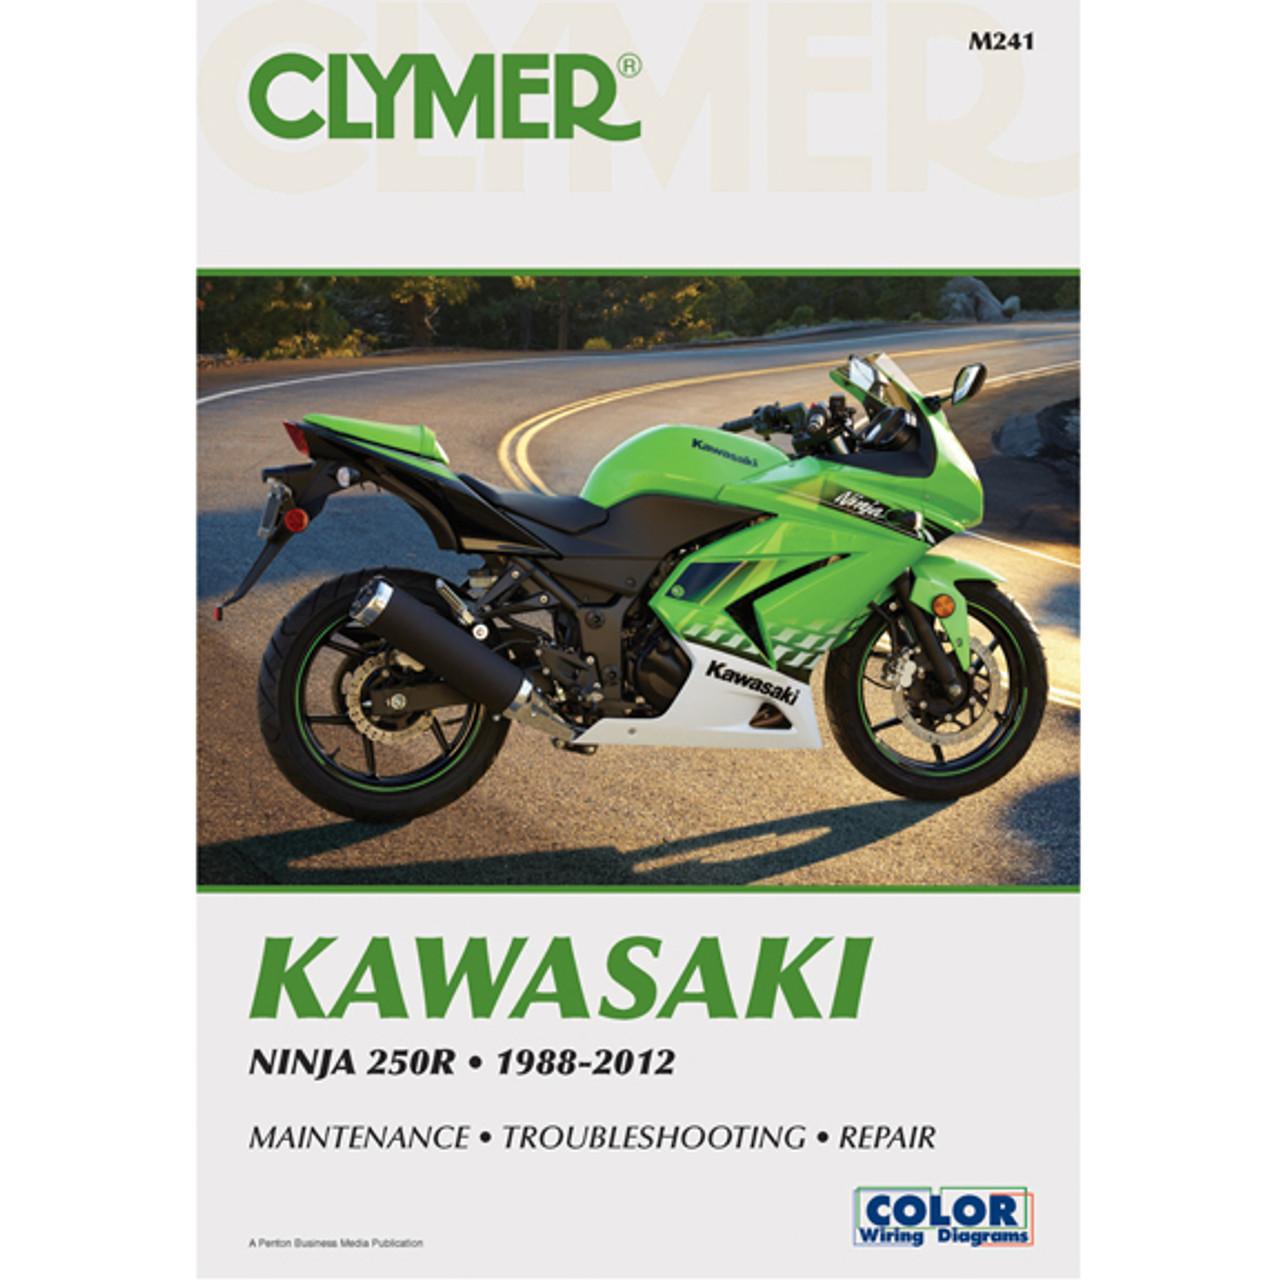 kawasaki klx650 1997 repair service manual